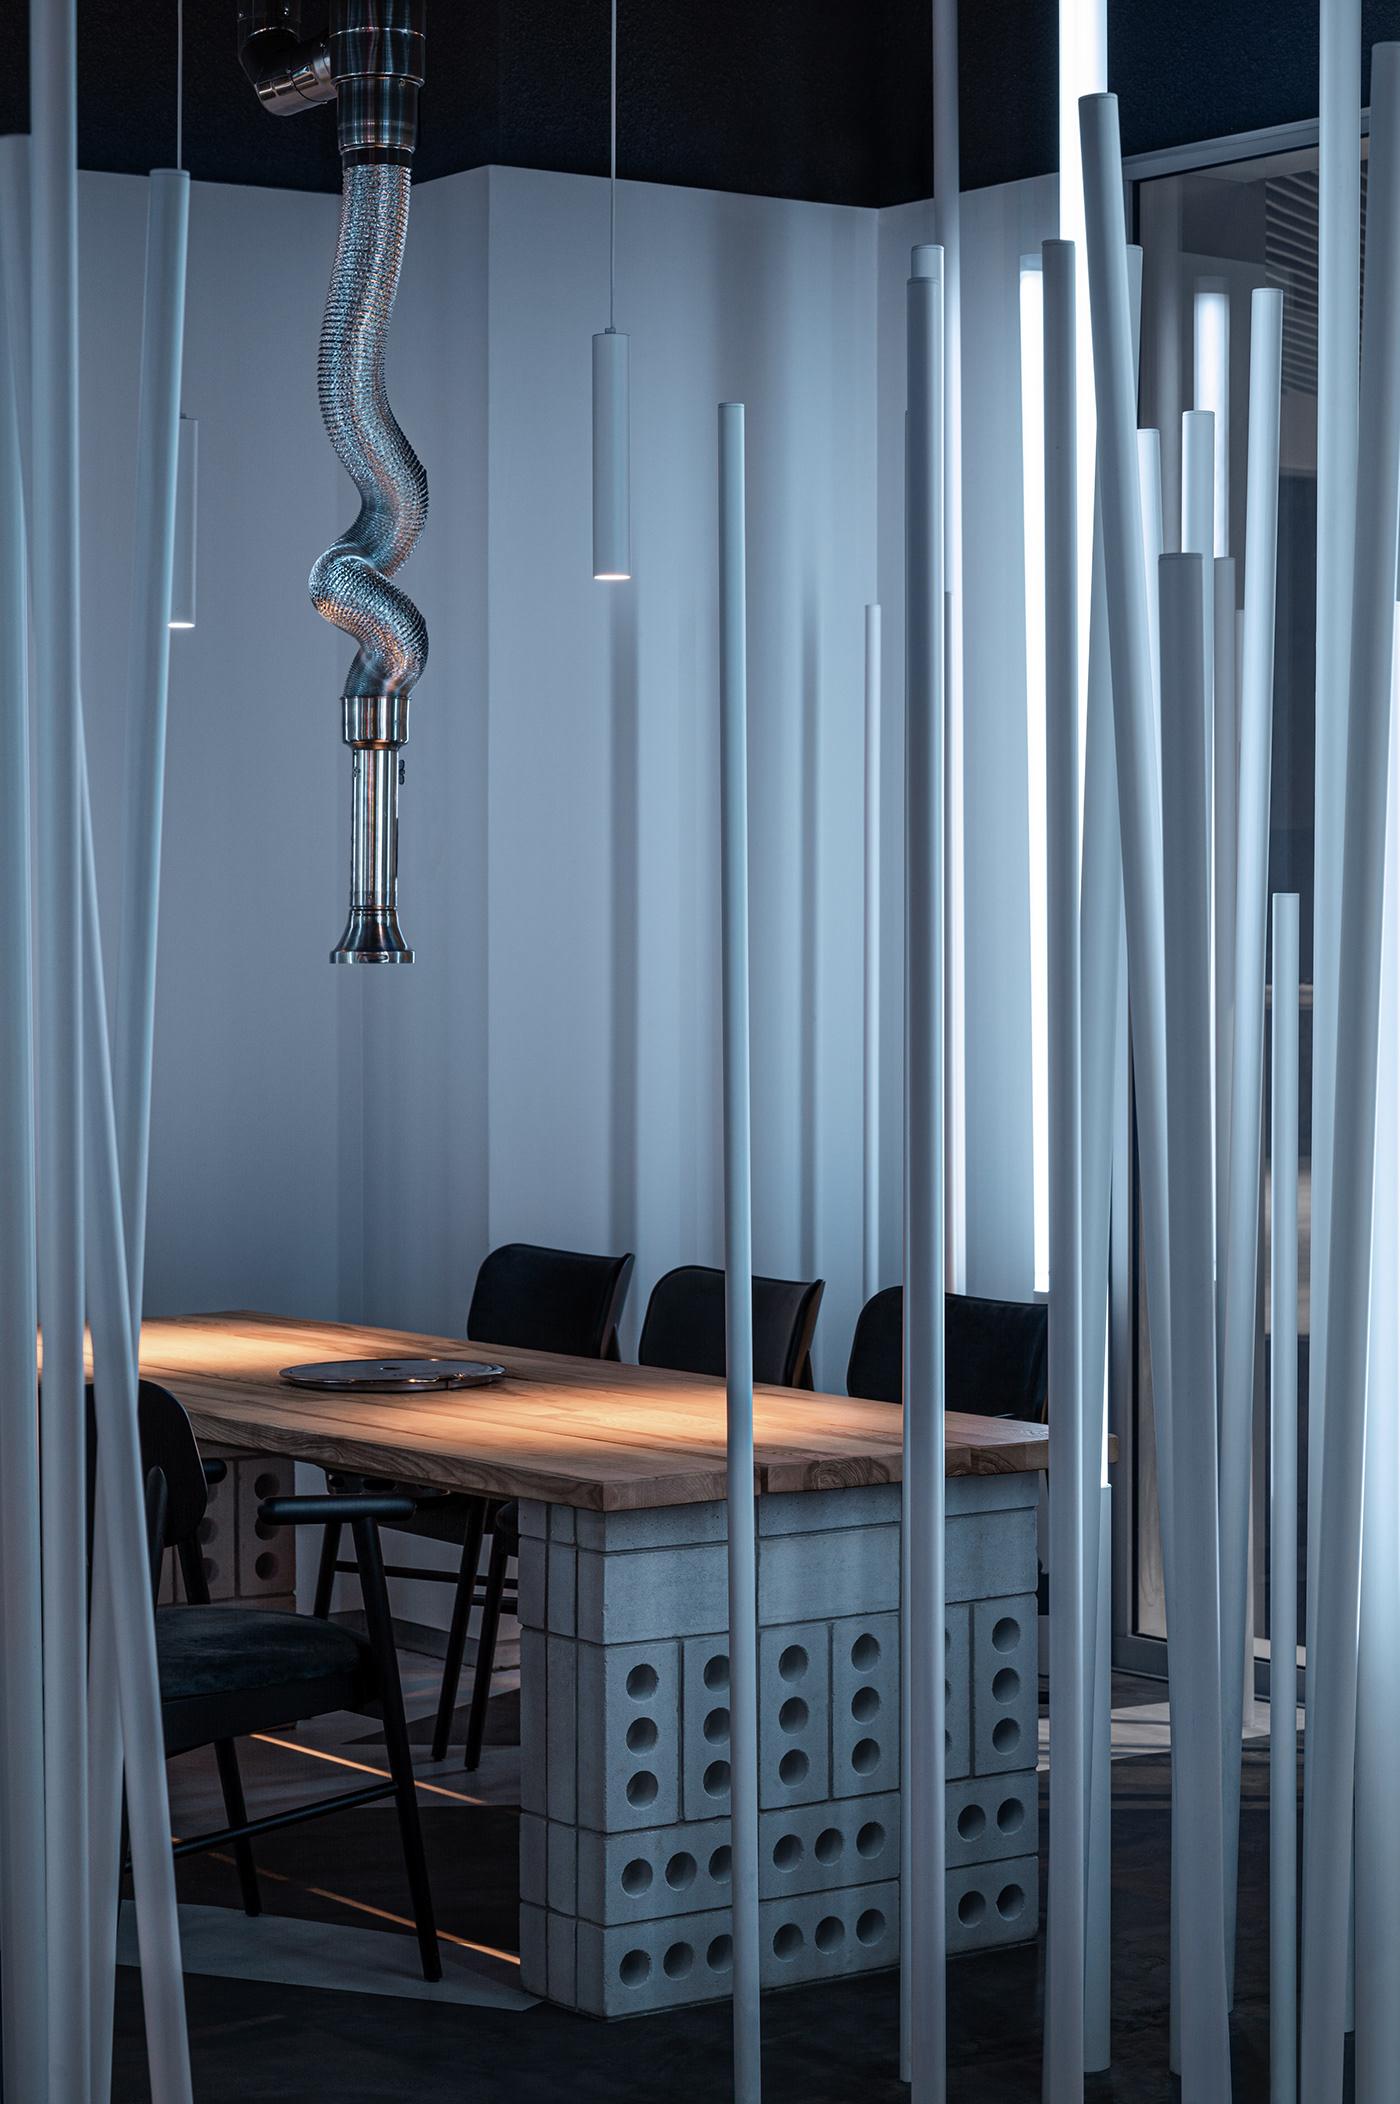 architecture Balbek Bureau custom-made elements Interior Interior Architecture interior design  restaurant design restaurant interior interior lighting Lighting Design